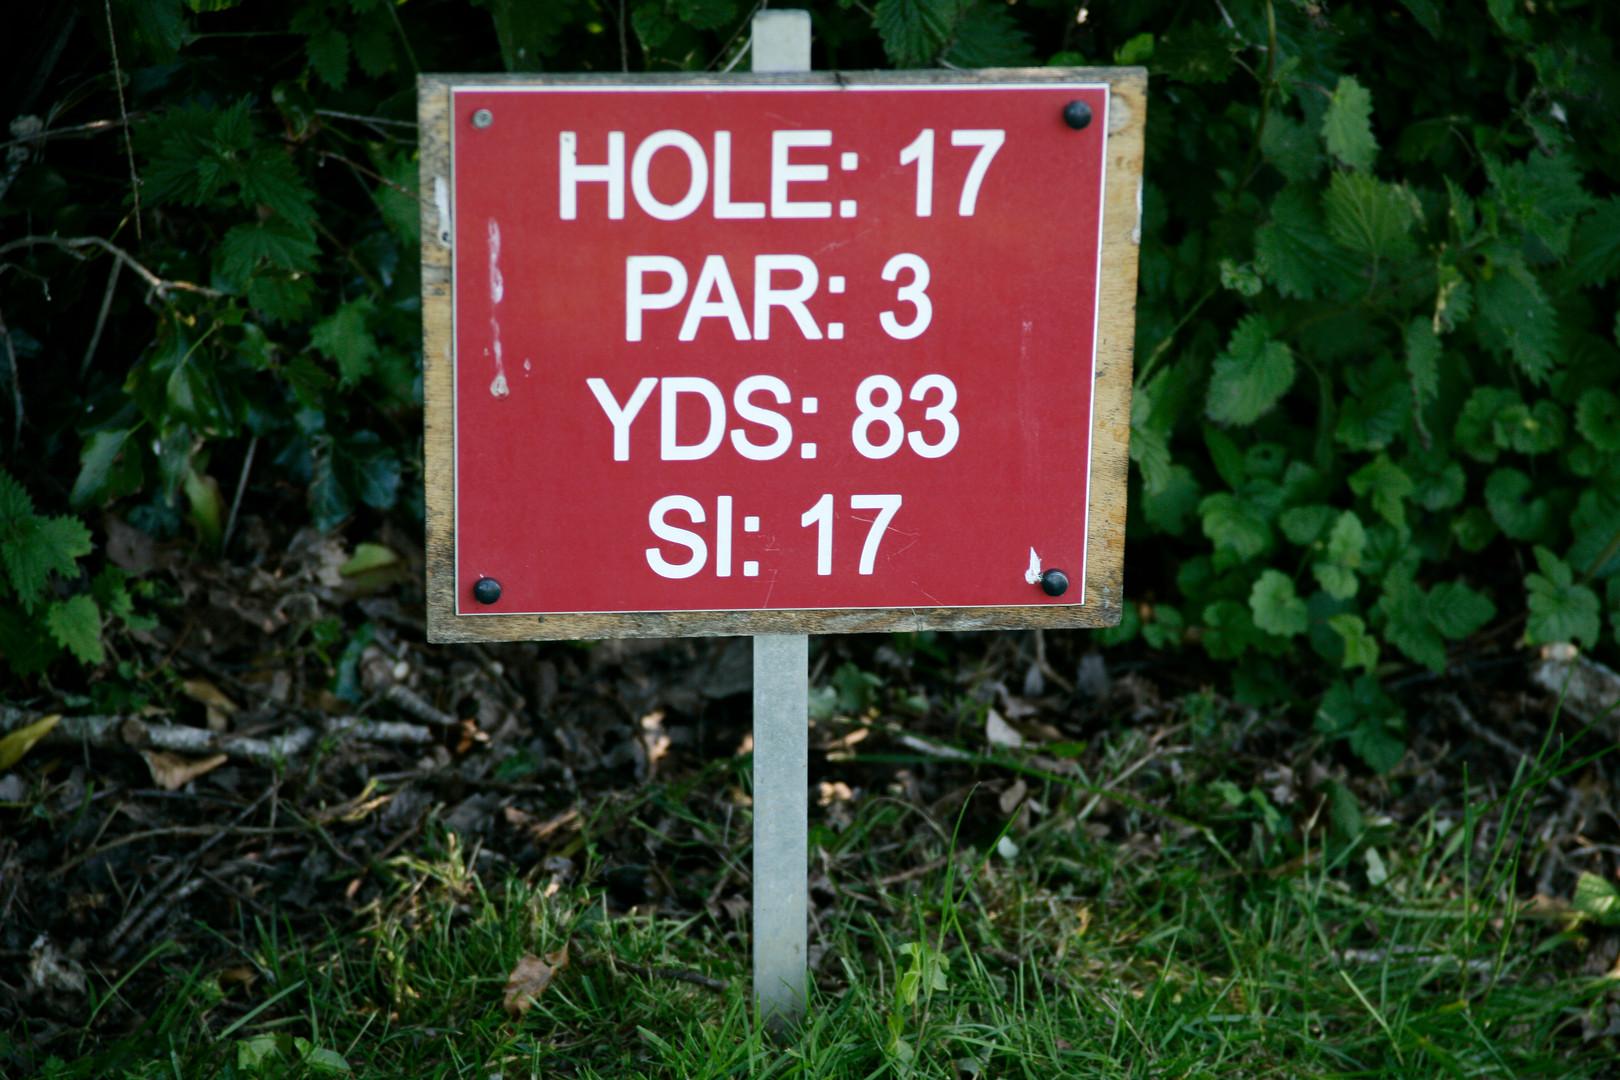 040 - Hole 17.JPG